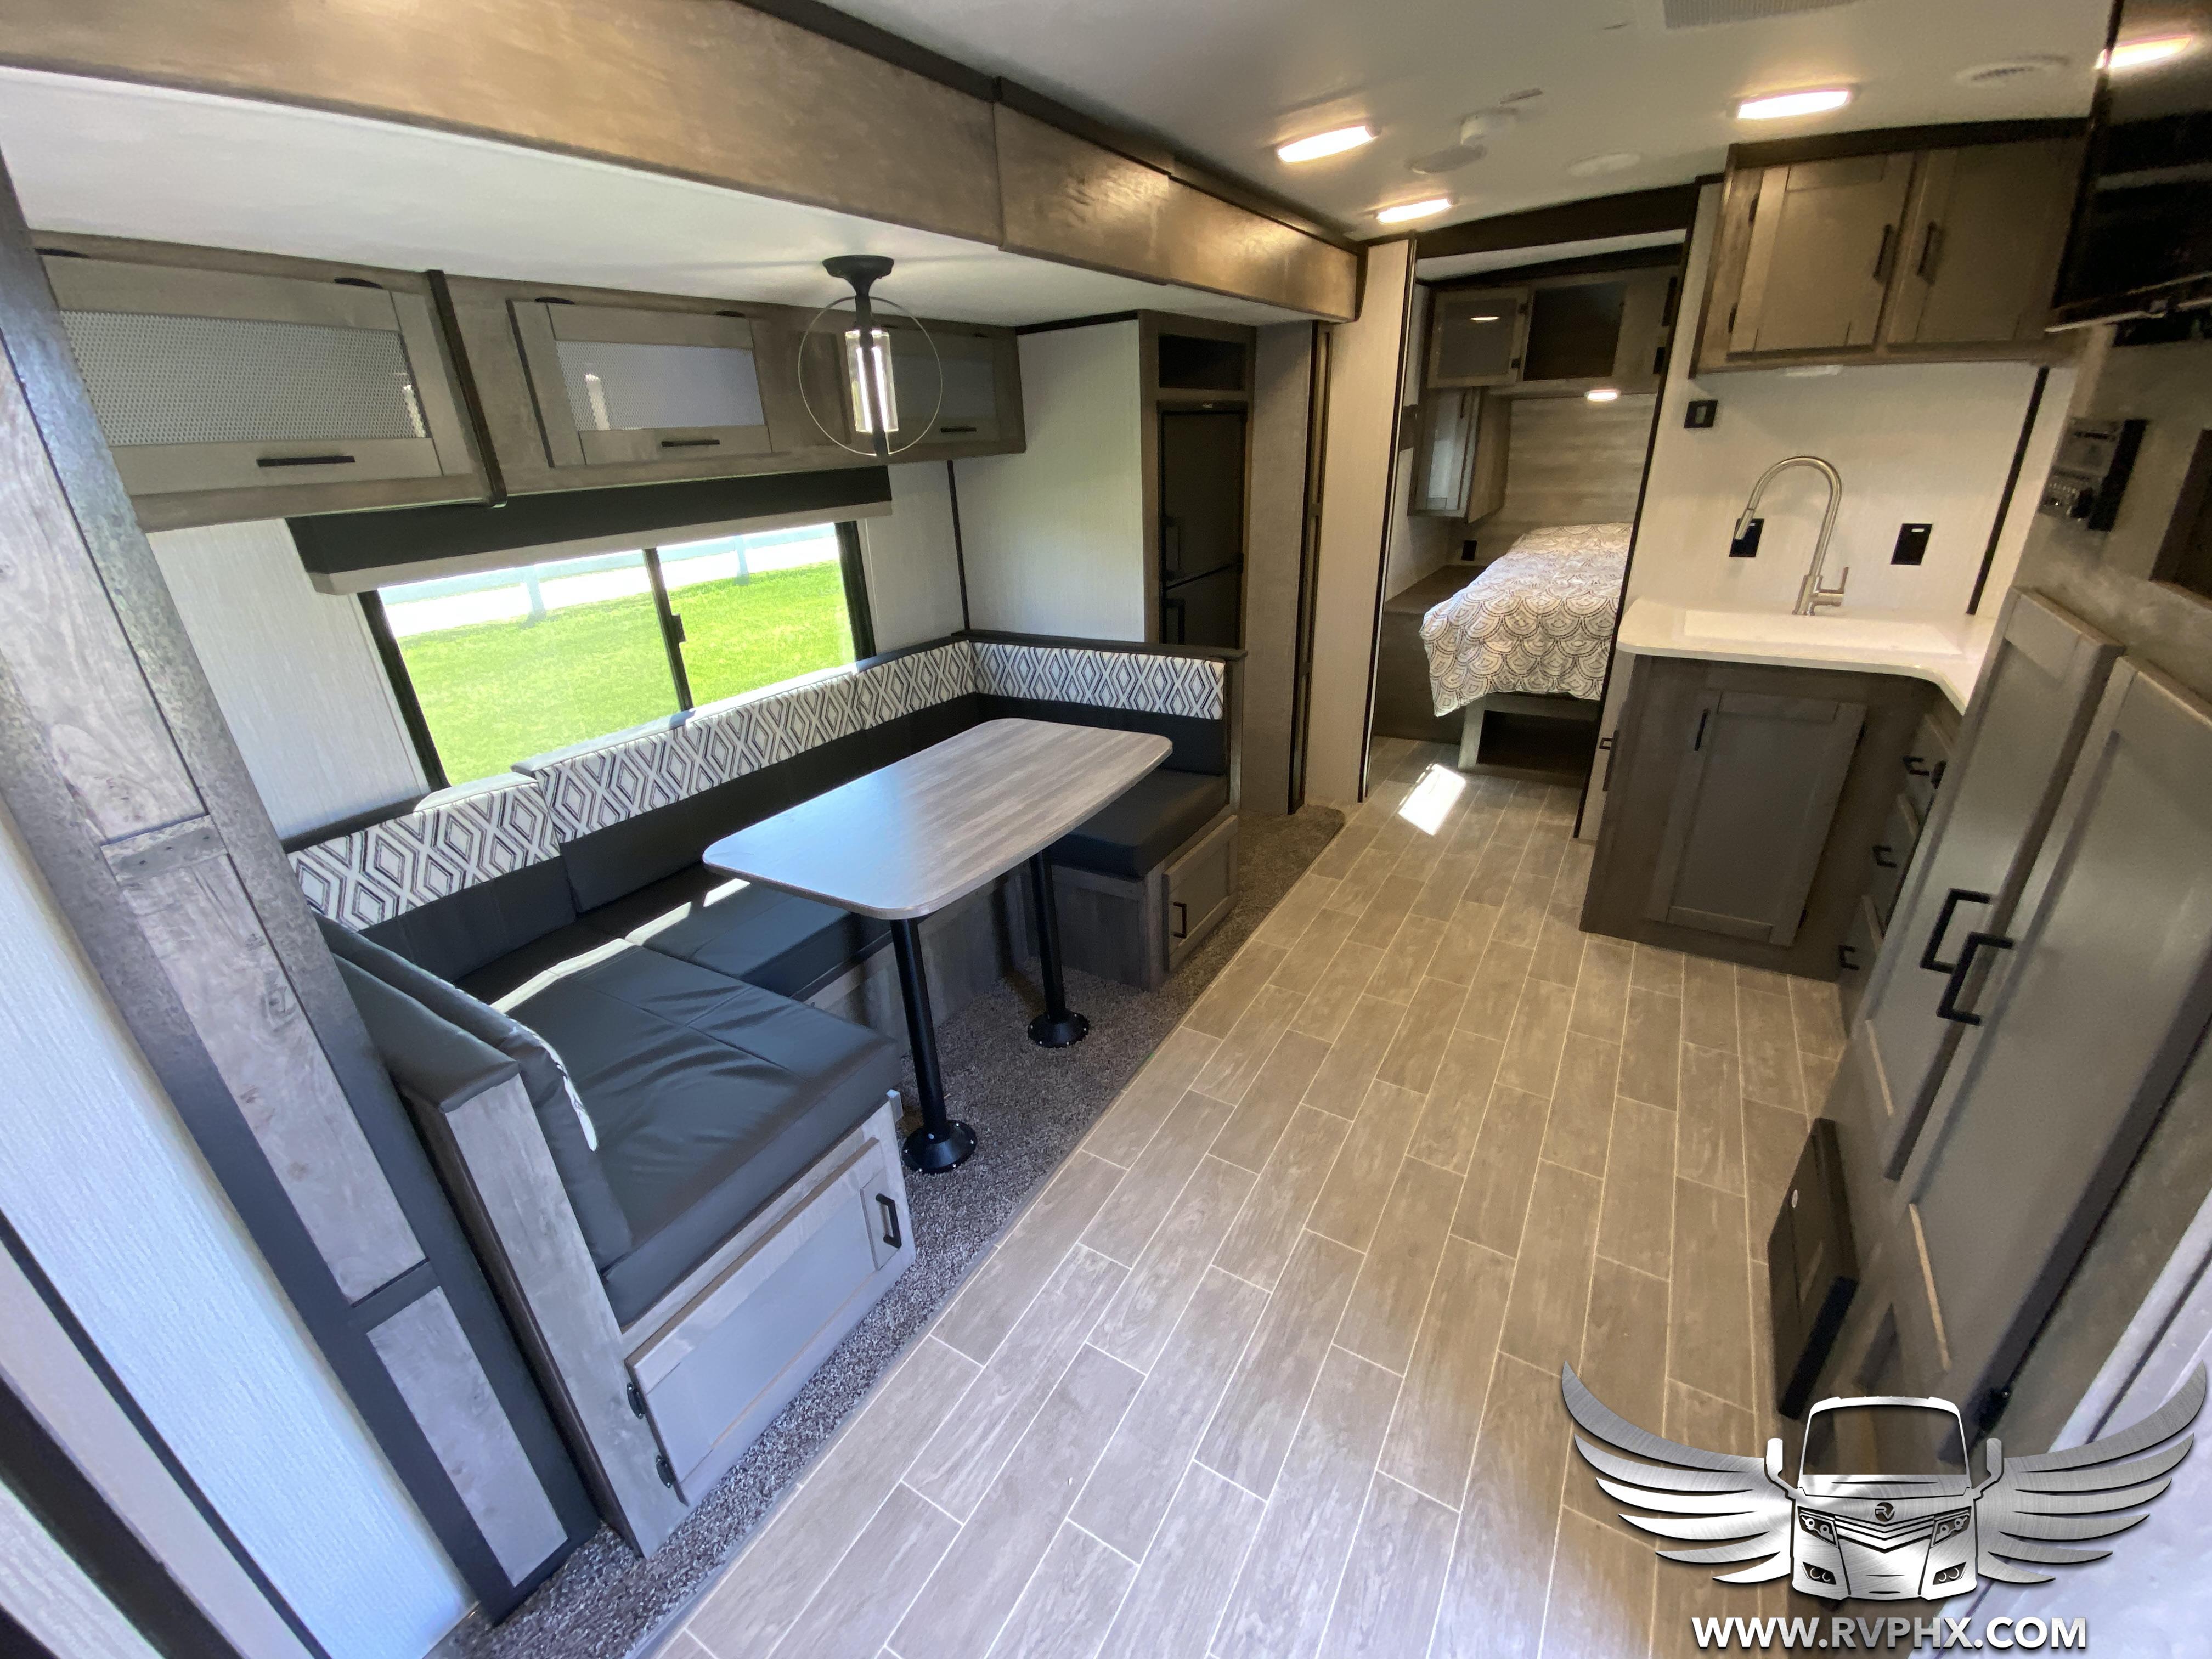 2510bh interior 0